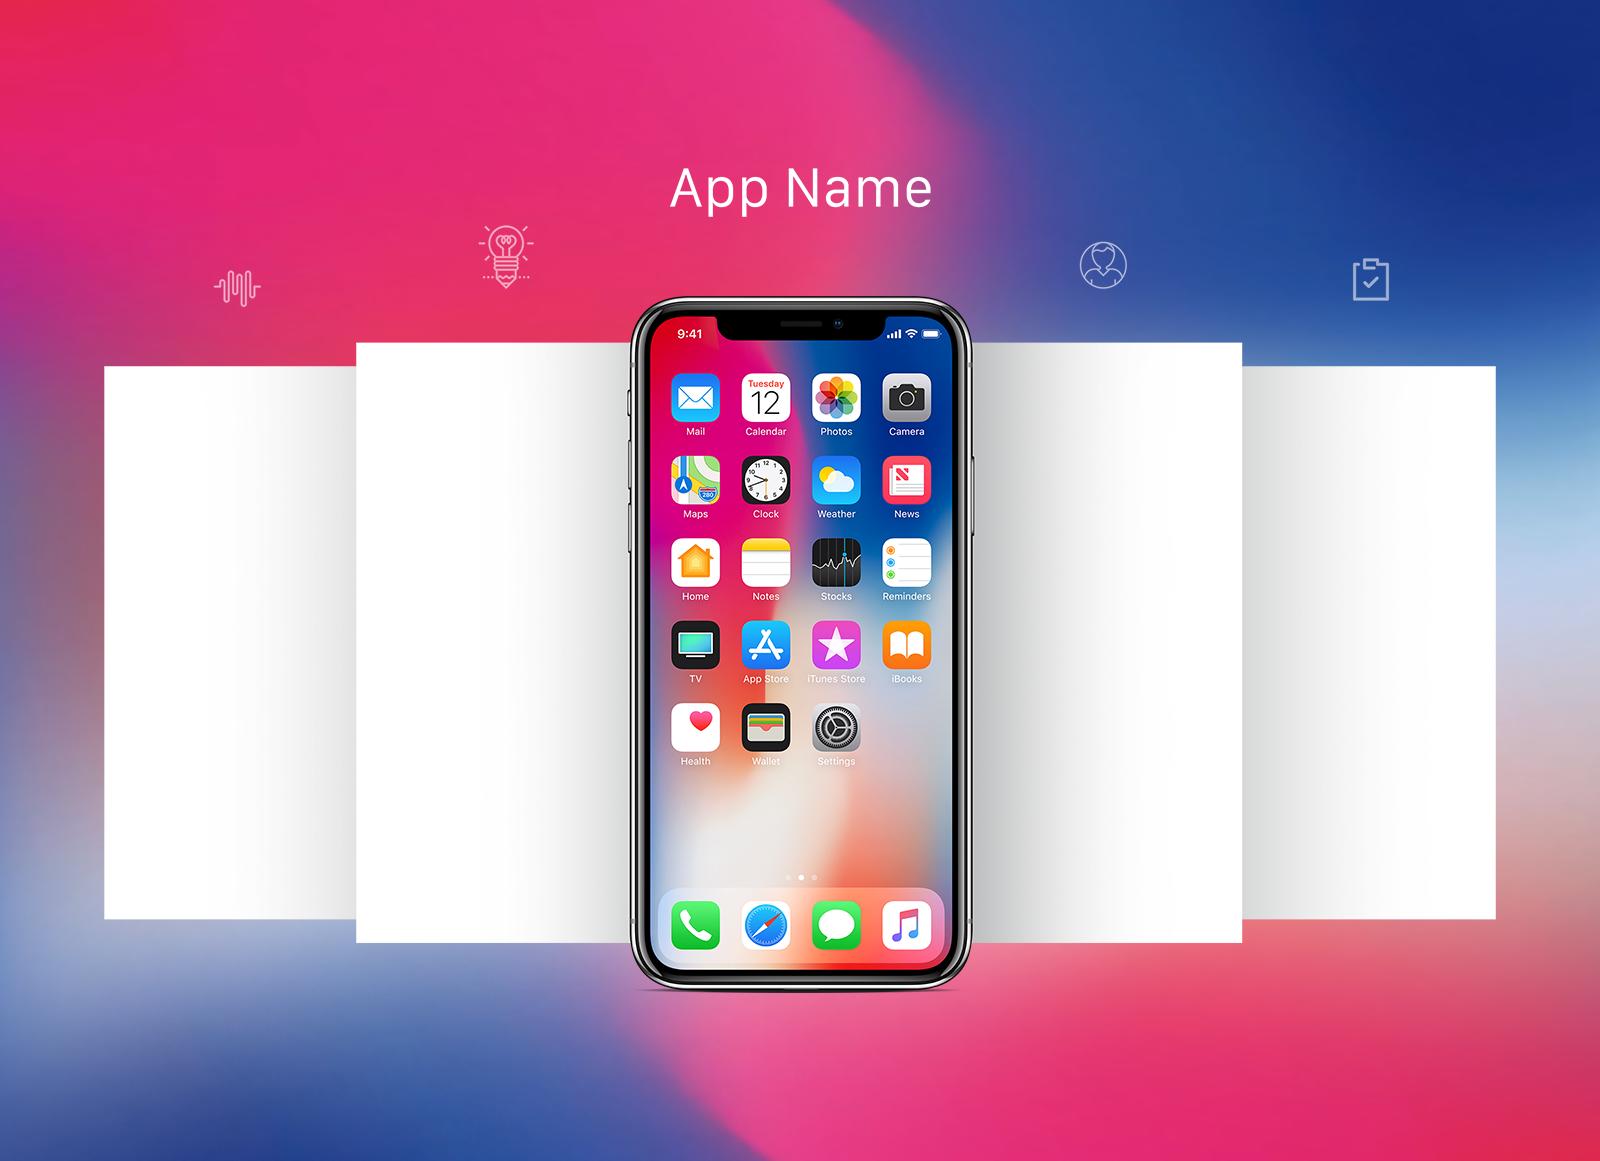 Free Apple Iphone X App Screen Mockup Psd Free Iphone Iphone App